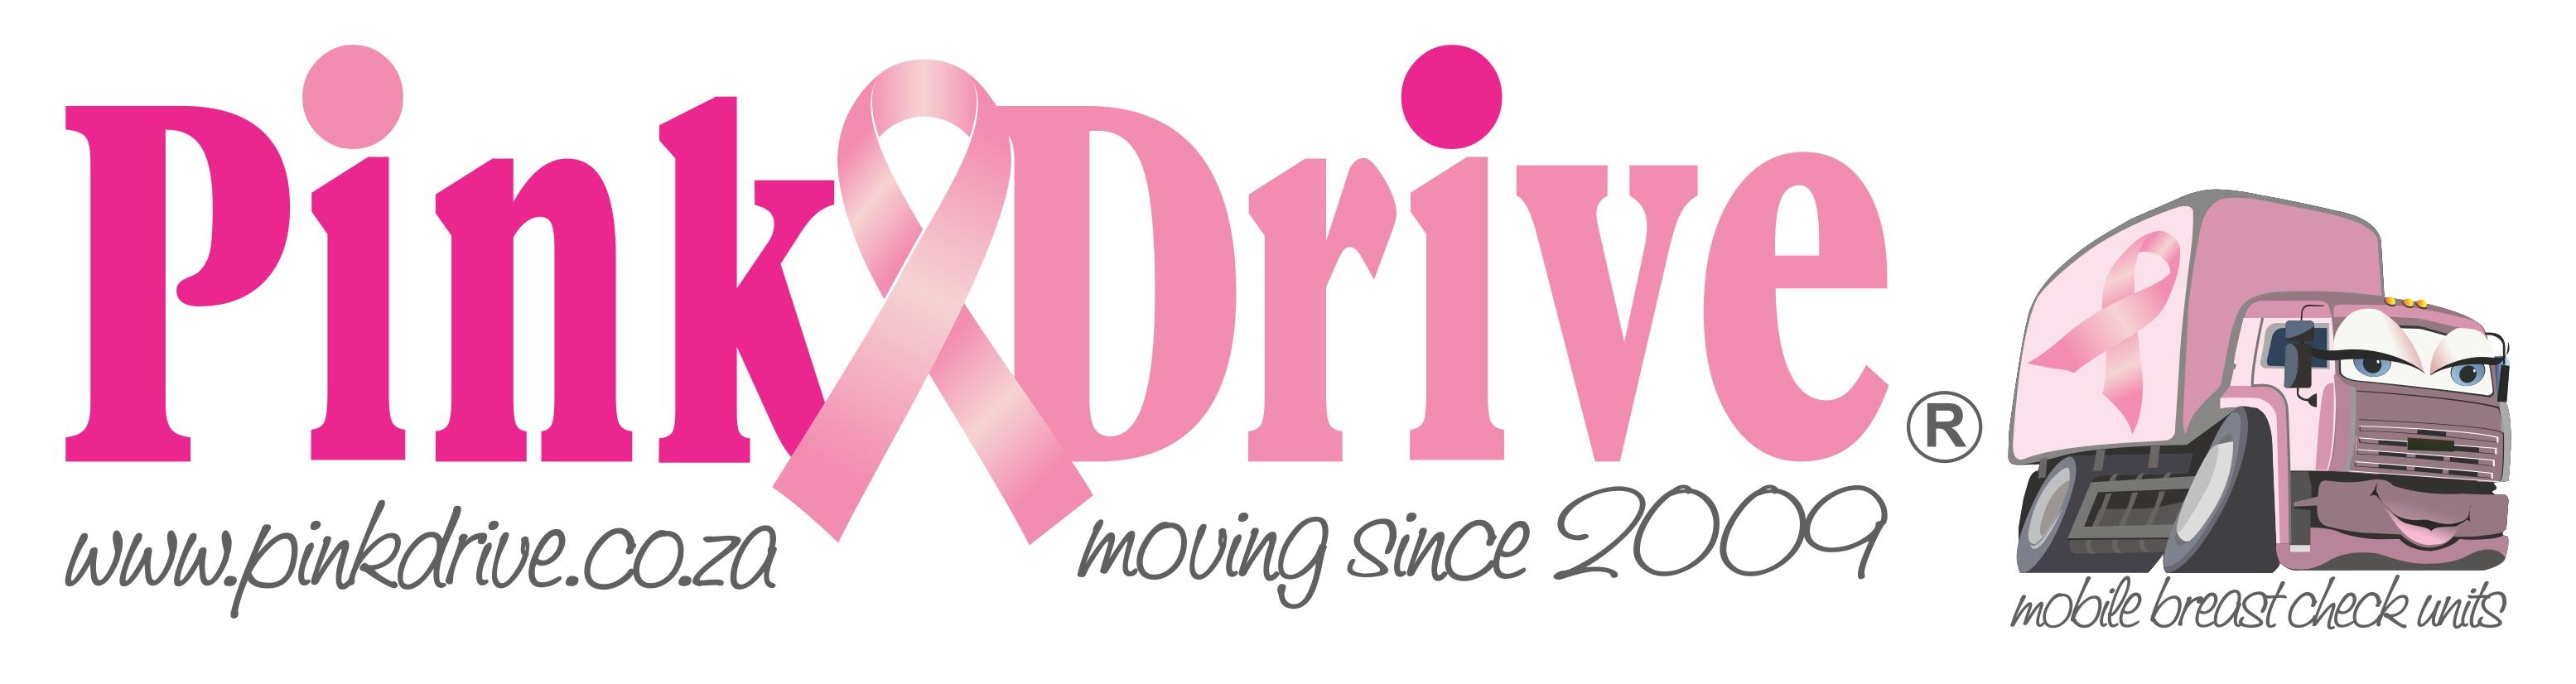 PinkDrive NPC